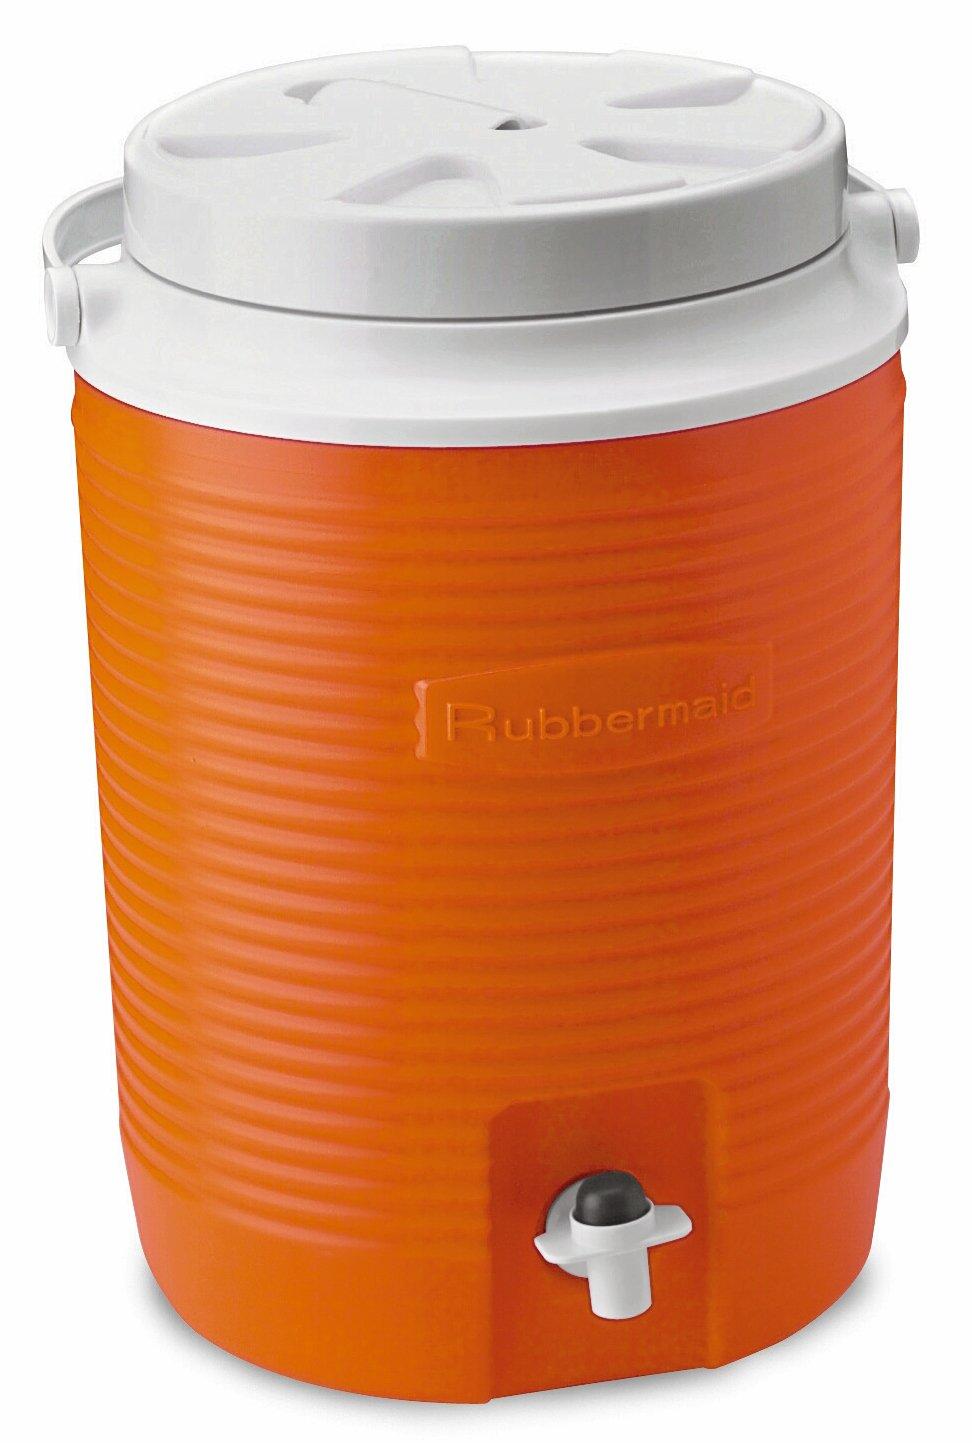 Rubbermaid Victory Jug, 2 Gallon, Orange 1530-04-11